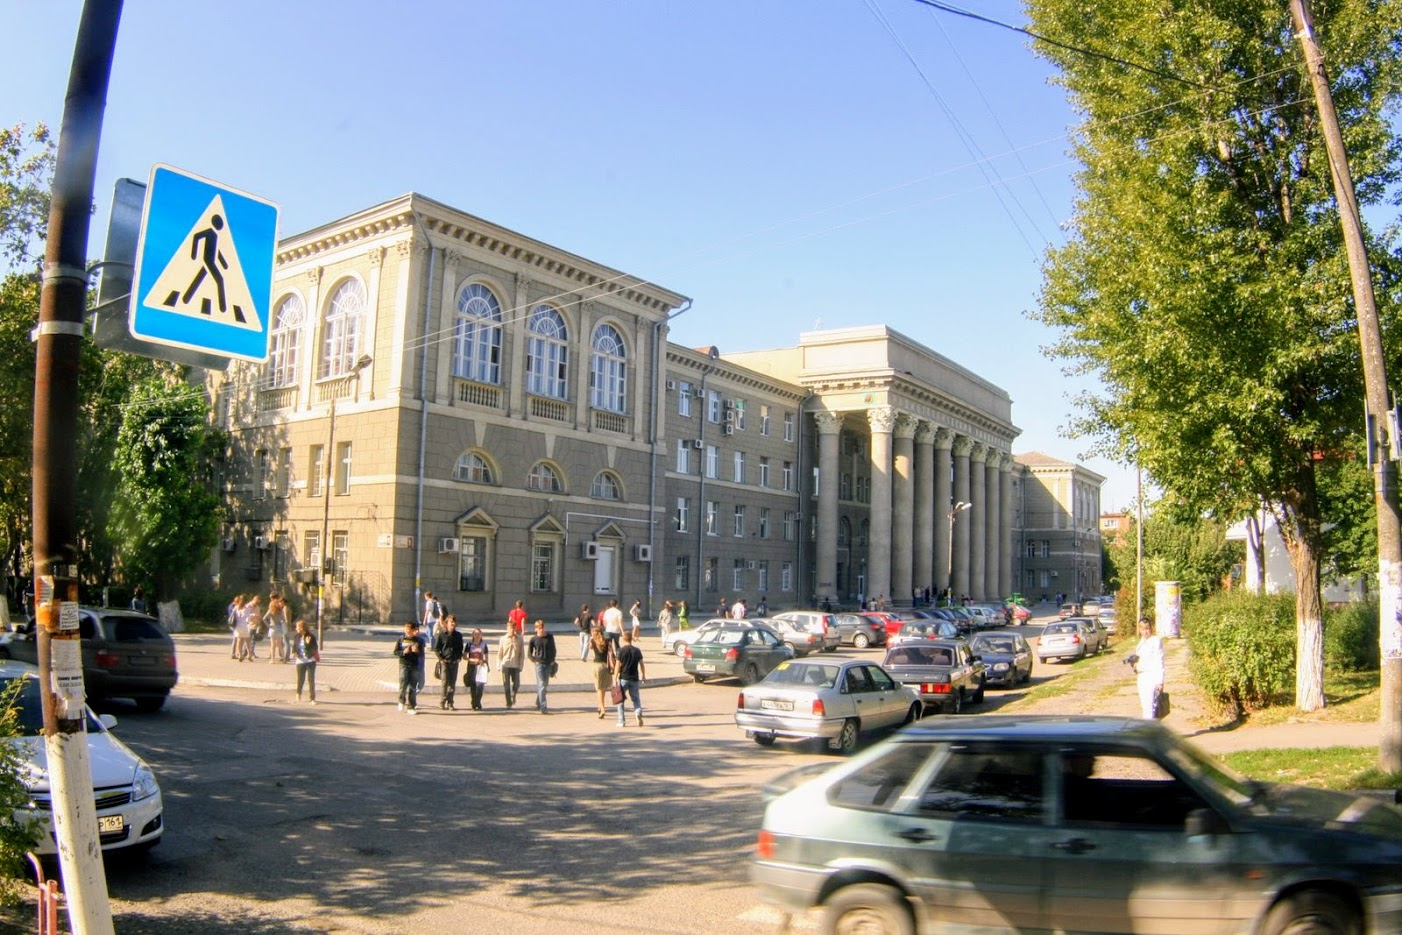 https://sites.google.com/site/istoriceskijtaganrog/nekrasovskij-pereulok/rybnaa-plosad